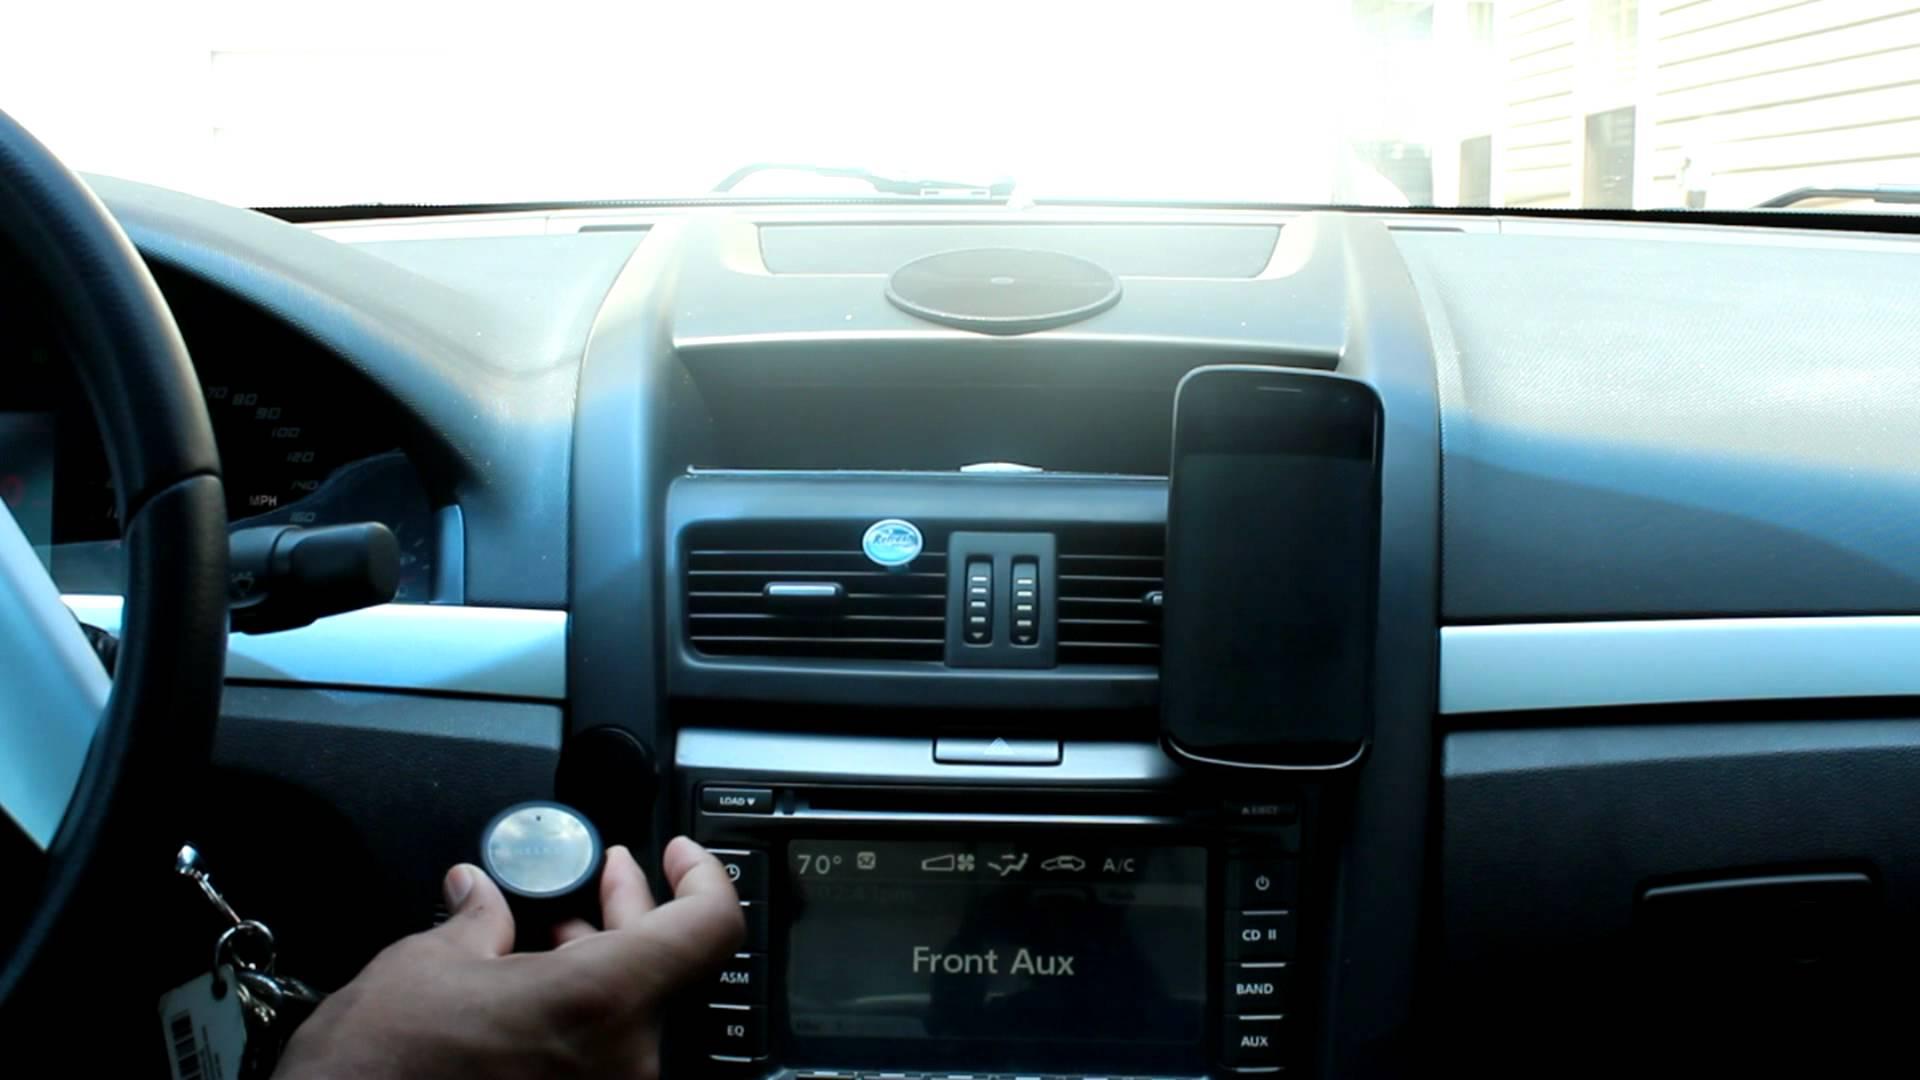 Best Car Gadgets For Road Trip